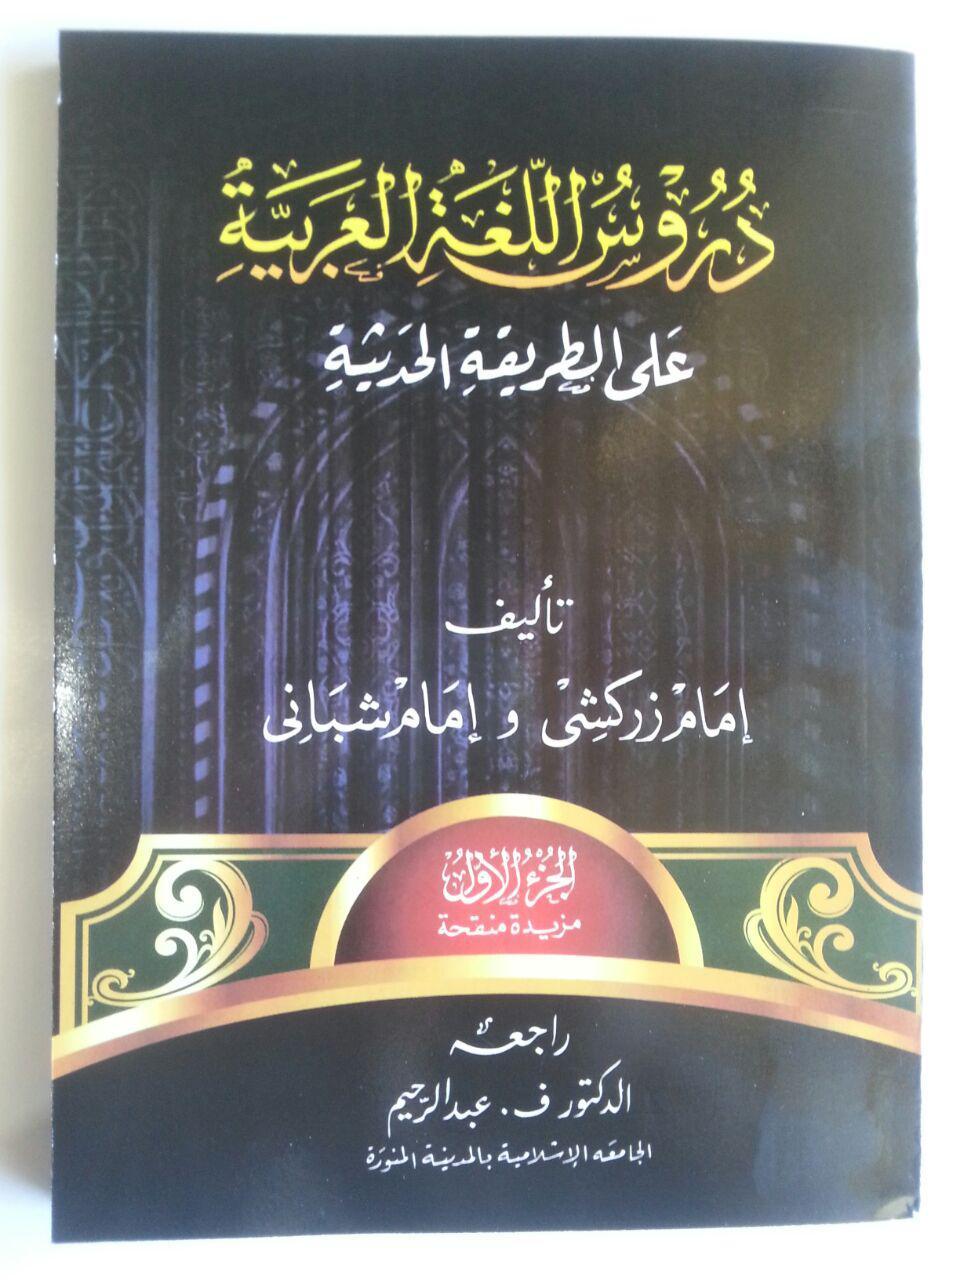 Buku Durusul Lughoh Versi Gontor (2 Jilid) cover 2